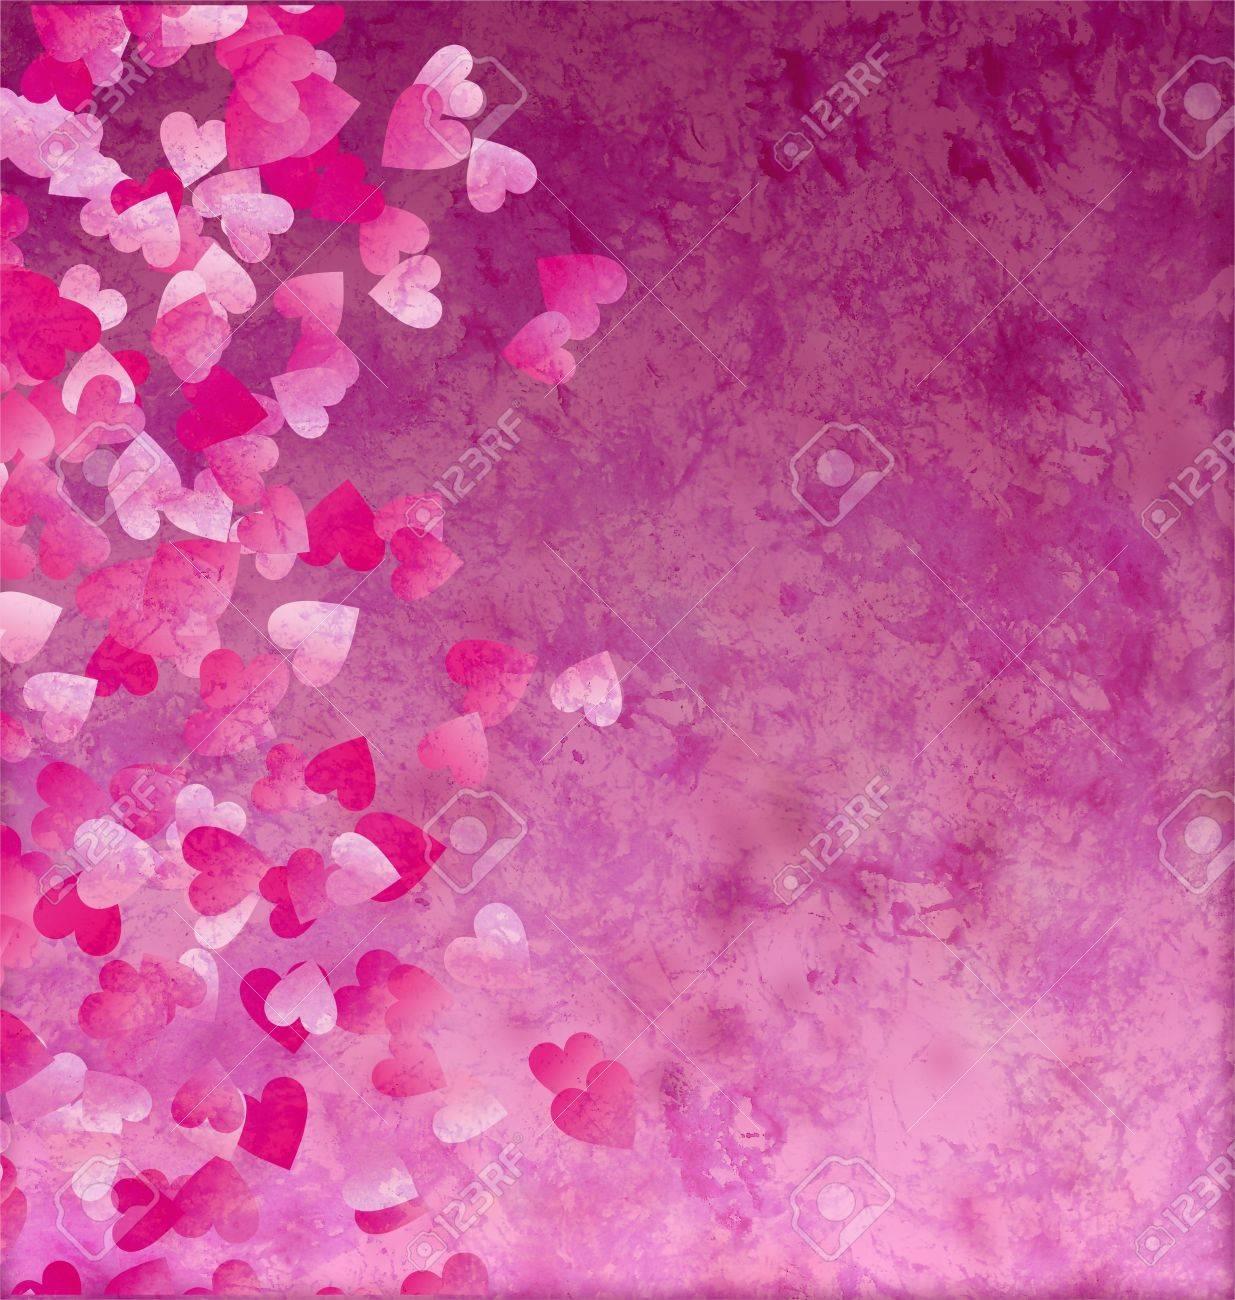 little hearts side grunge vintage paper background Stock Photo - 14821063